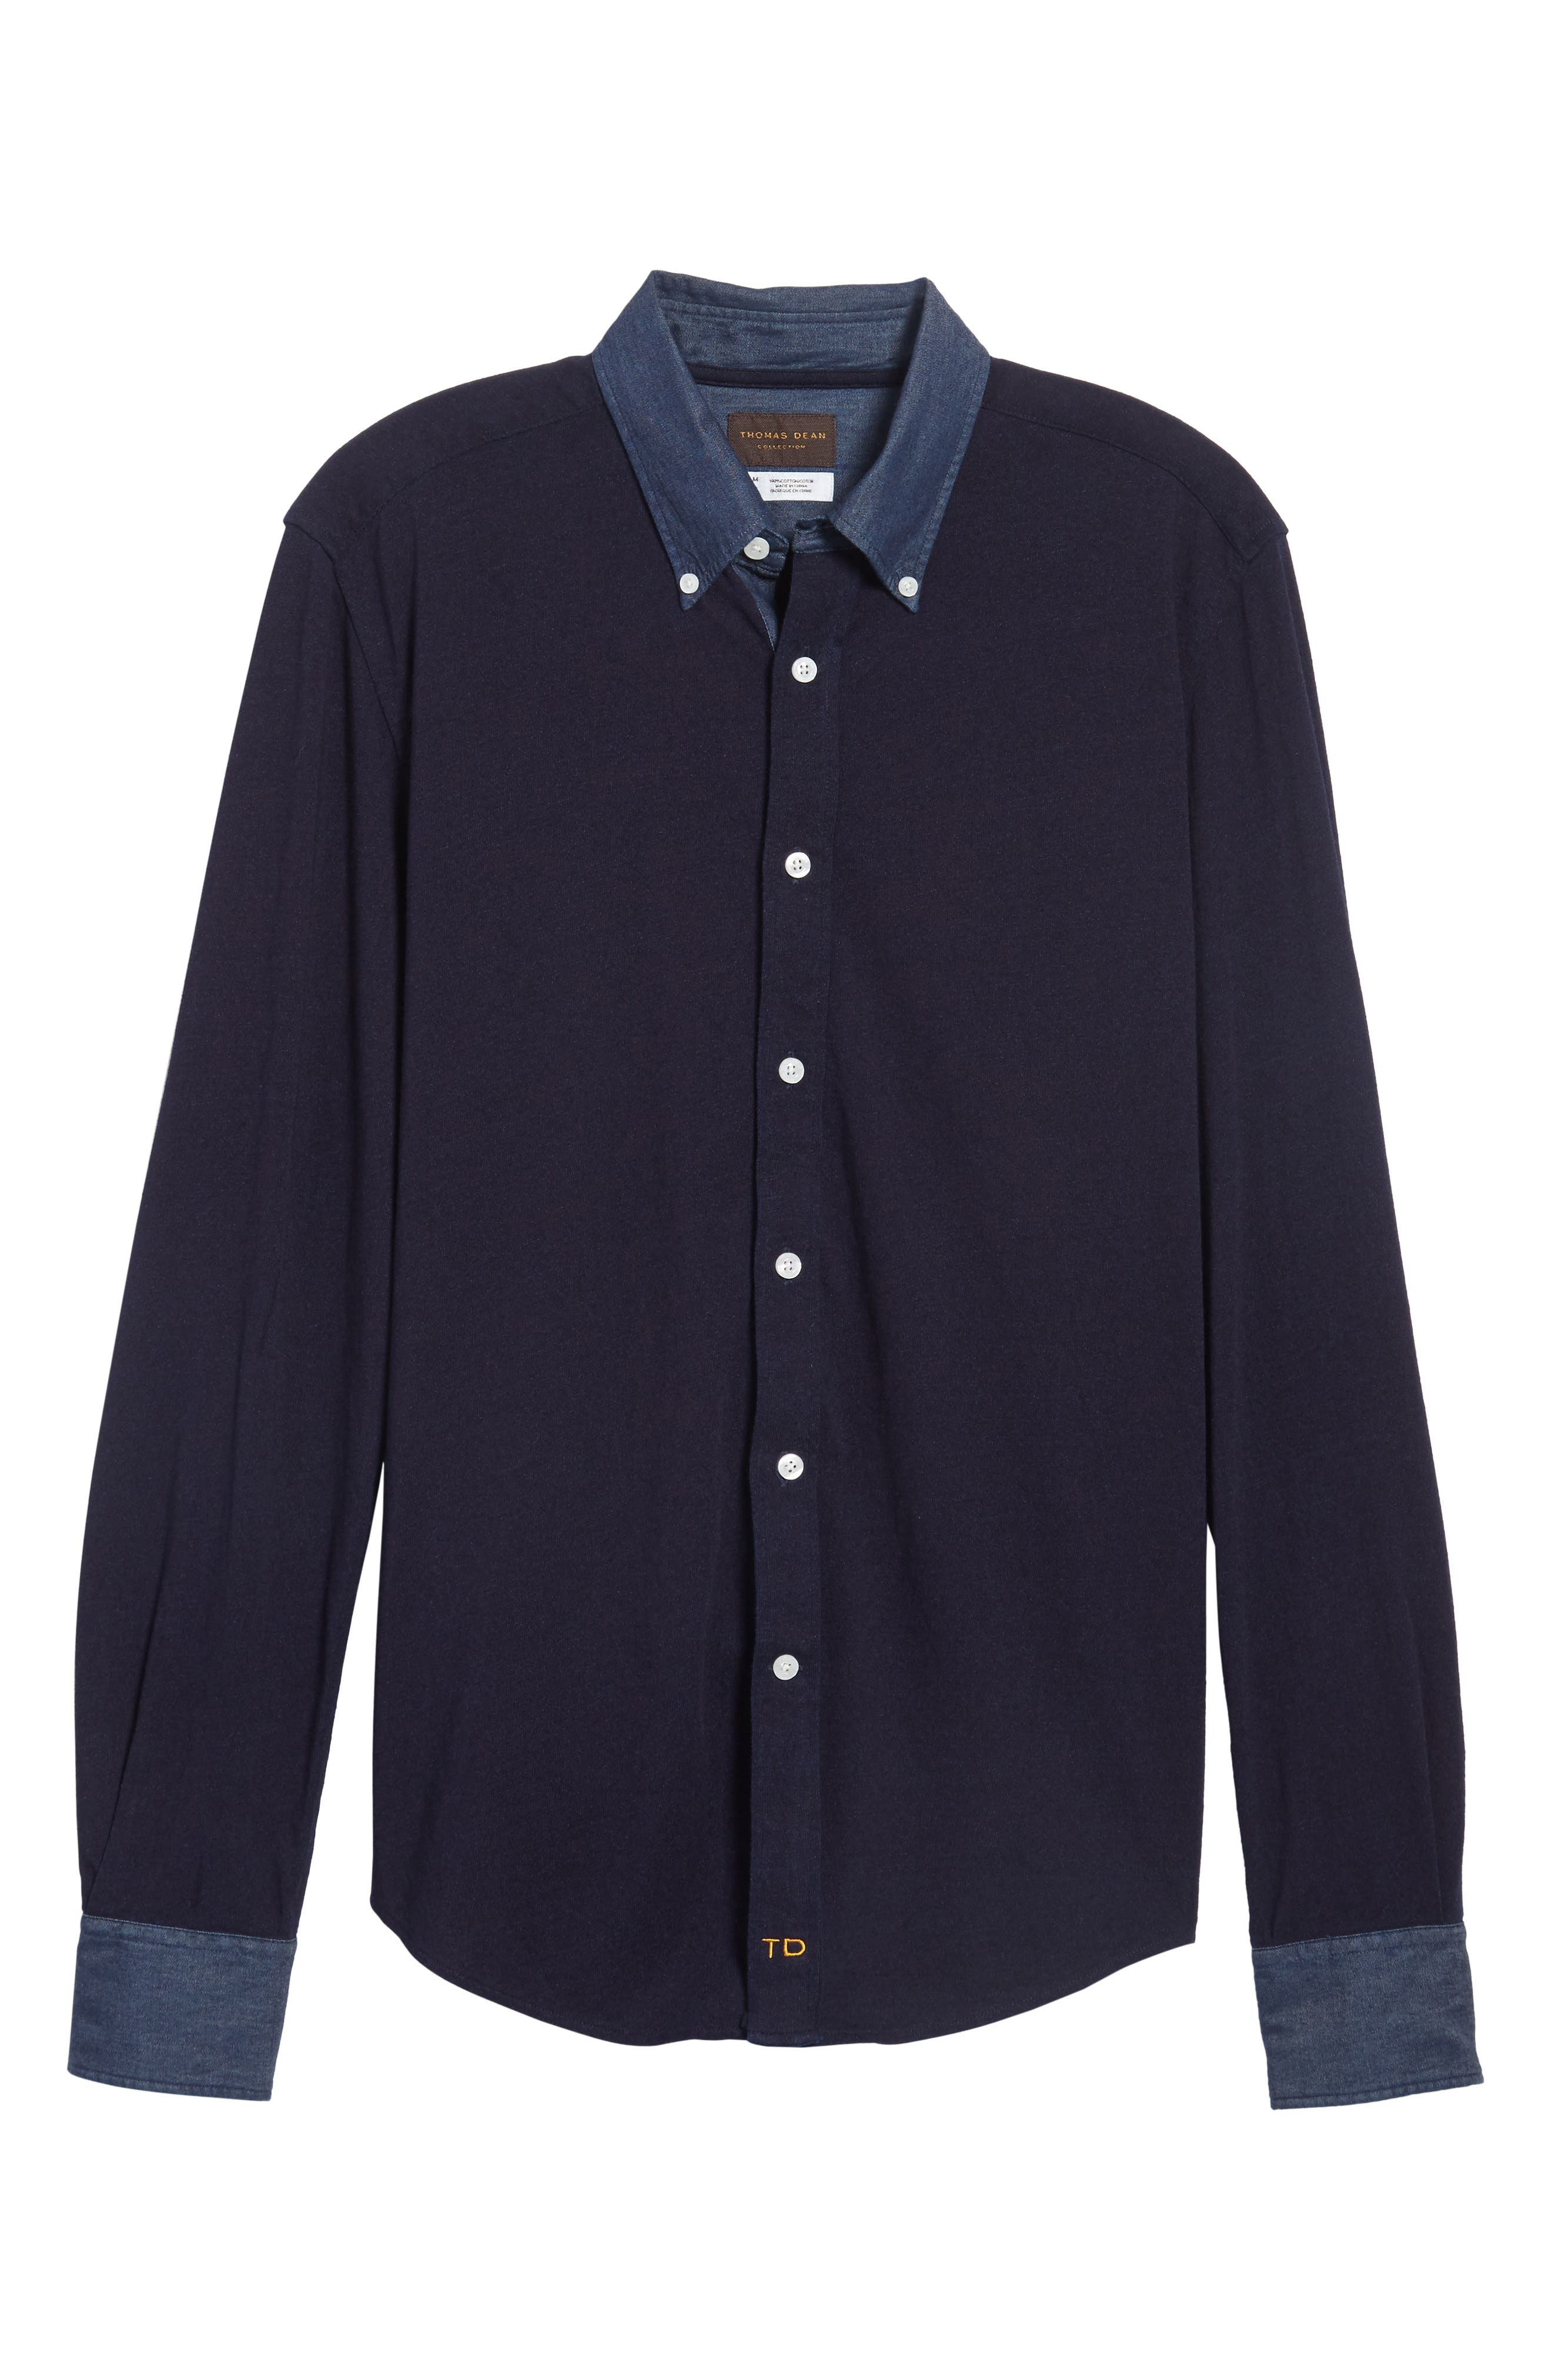 Regular Fit Chambray Trim Jersey Shirt,                             Alternate thumbnail 6, color,                             439